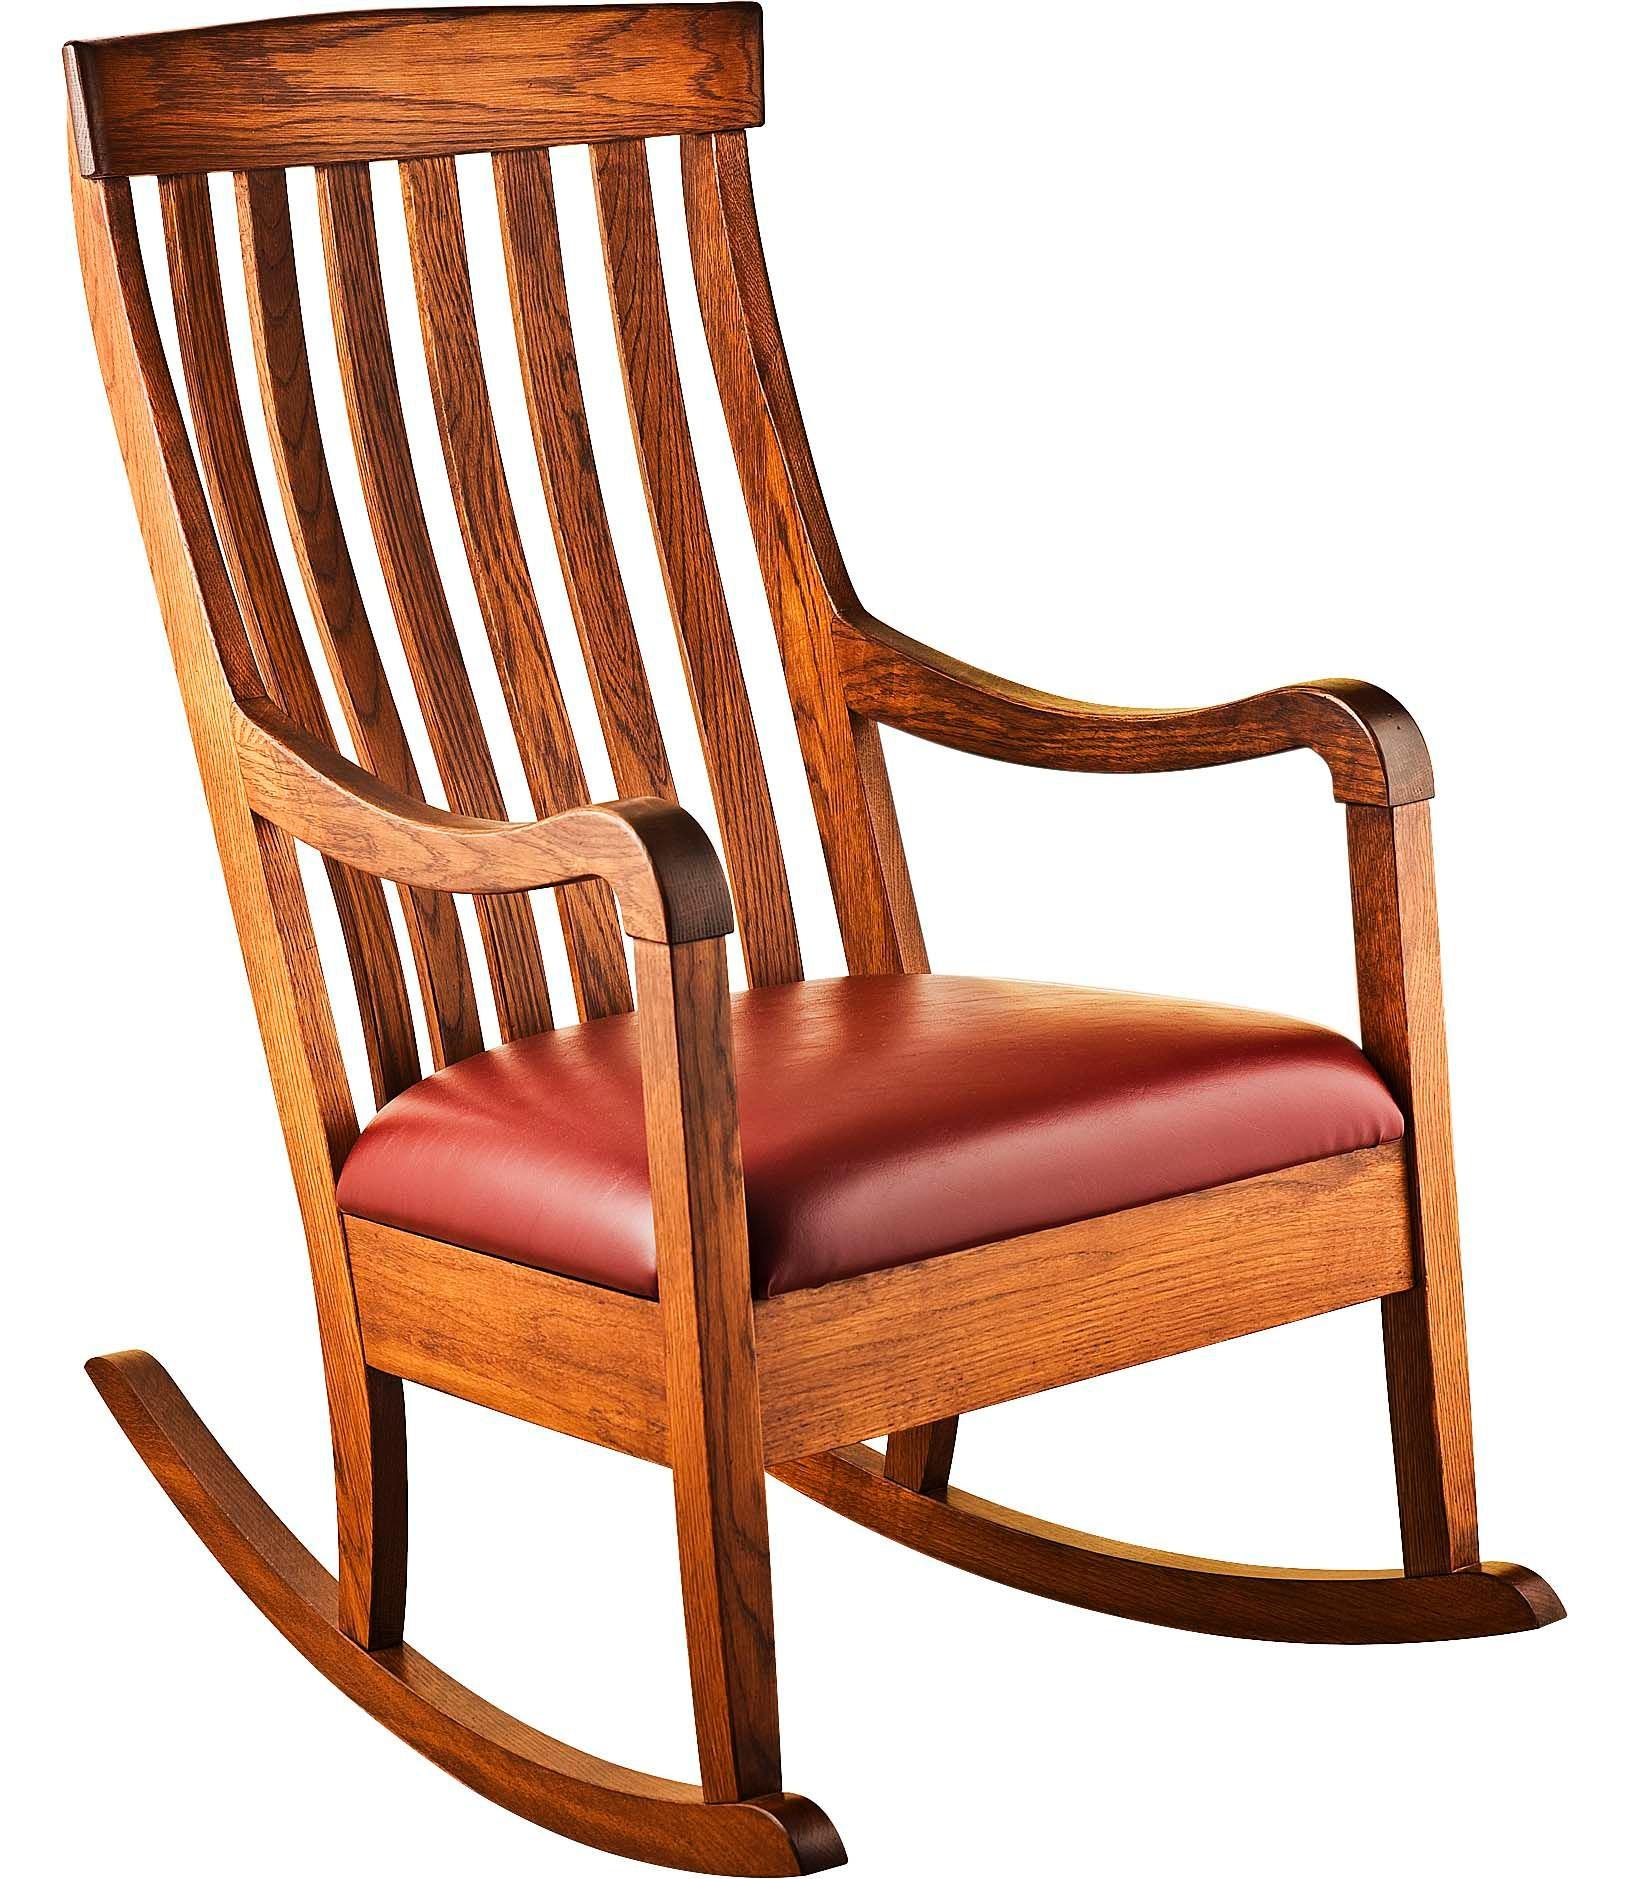 Superbe Paul Schatz Furniture